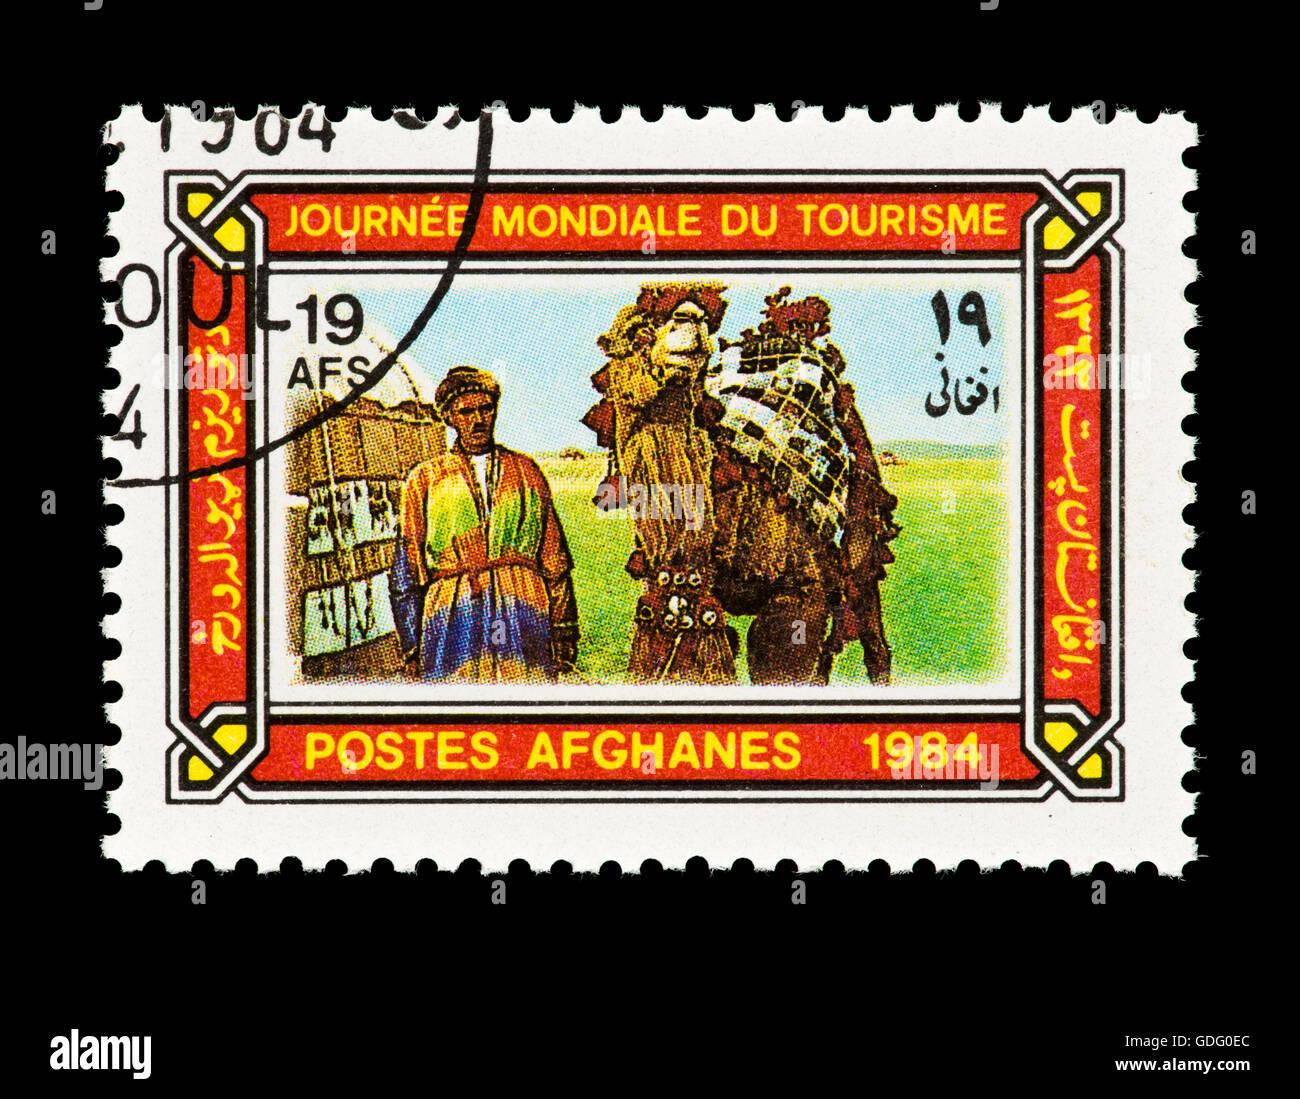 1984 Journee De Cultivateur Briefmarke Postes Afghanes